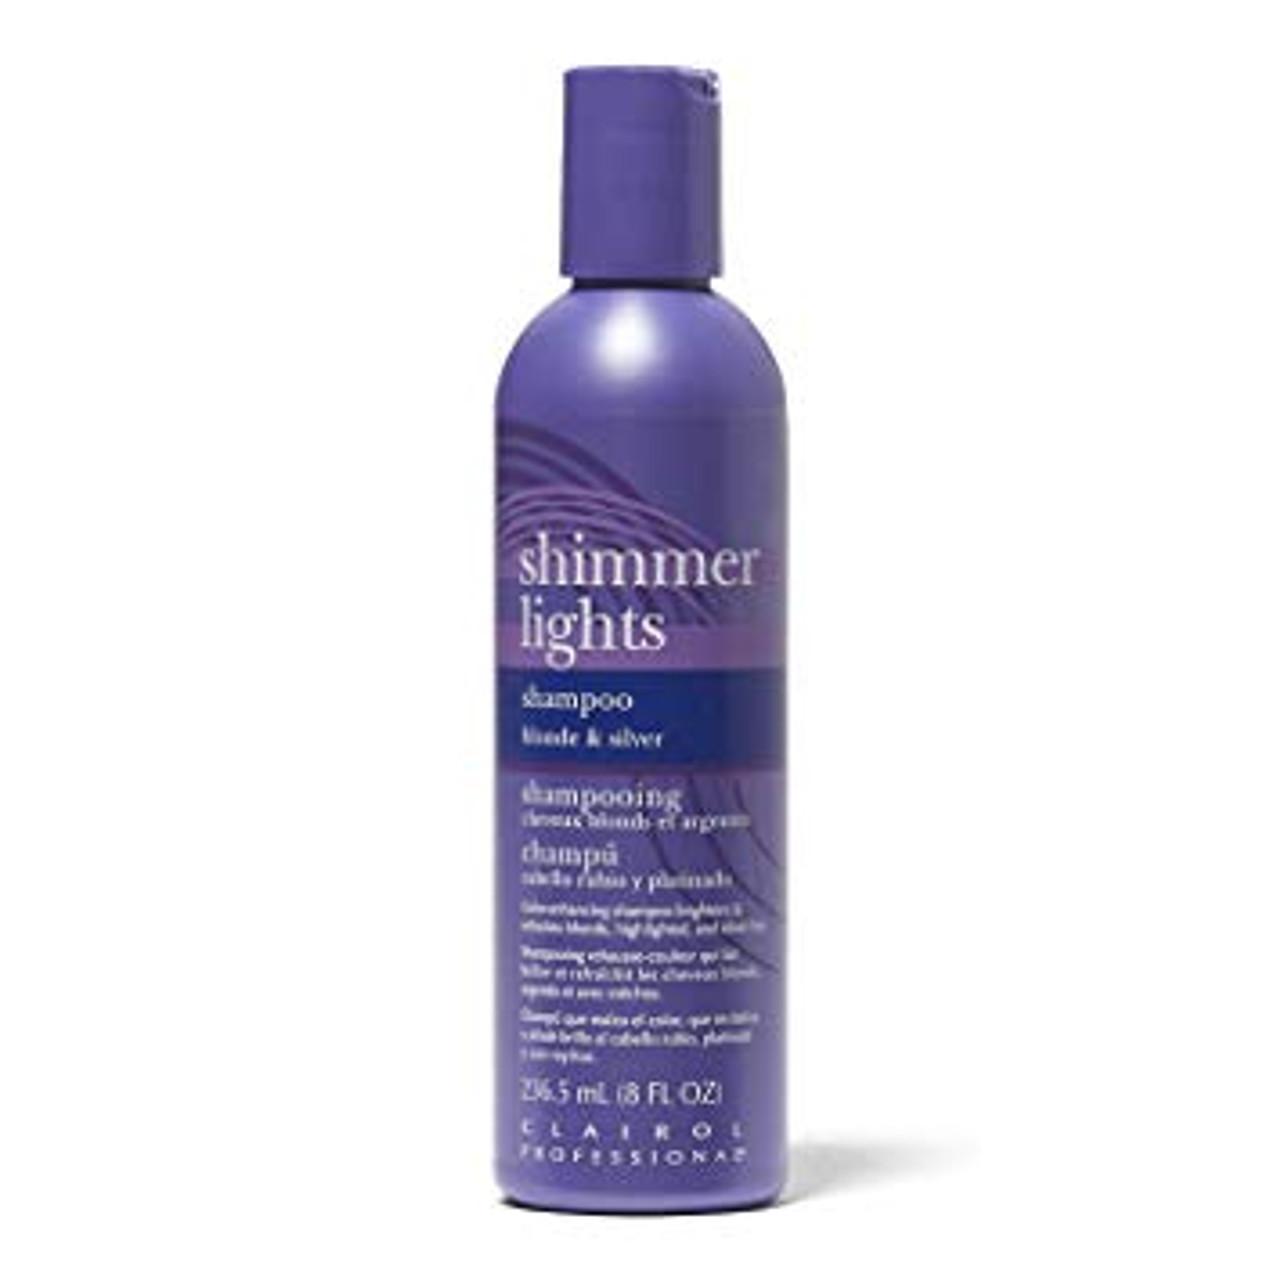 Clairol Shimmer Lights Shampoo 8 oz